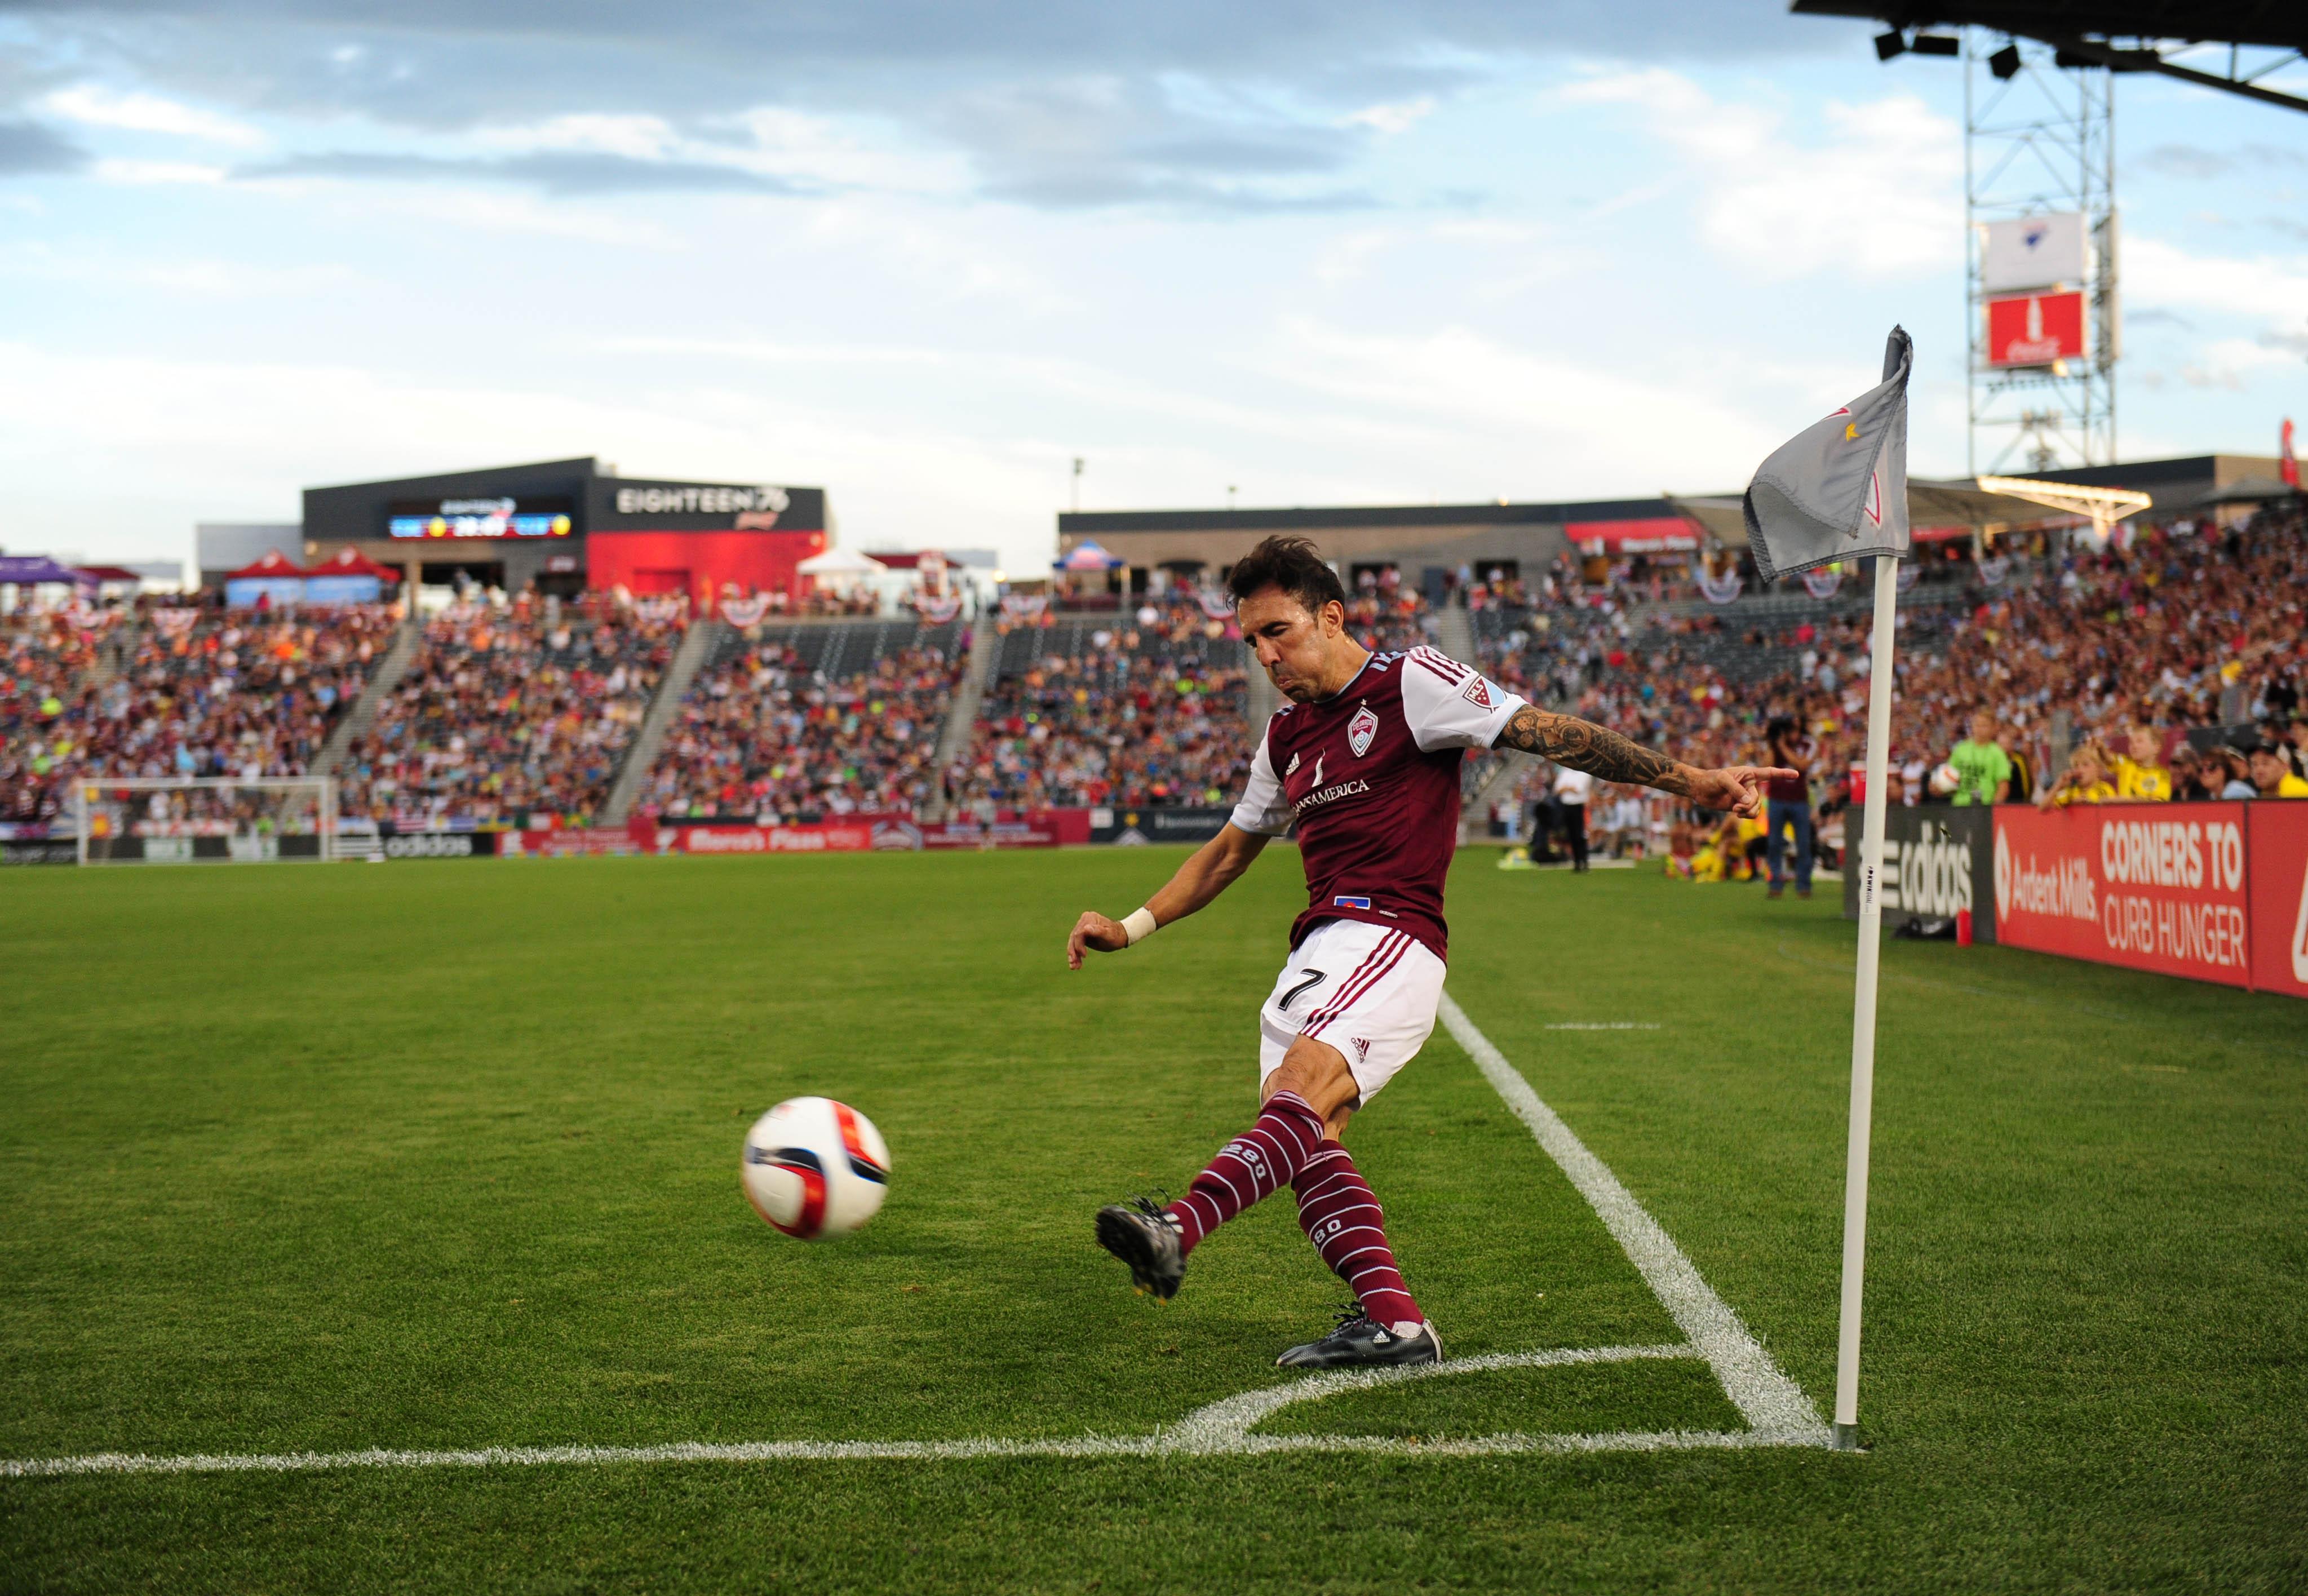 Vicente Sanchez taking one of his 10 corner kicks versus the Columbus Crew.